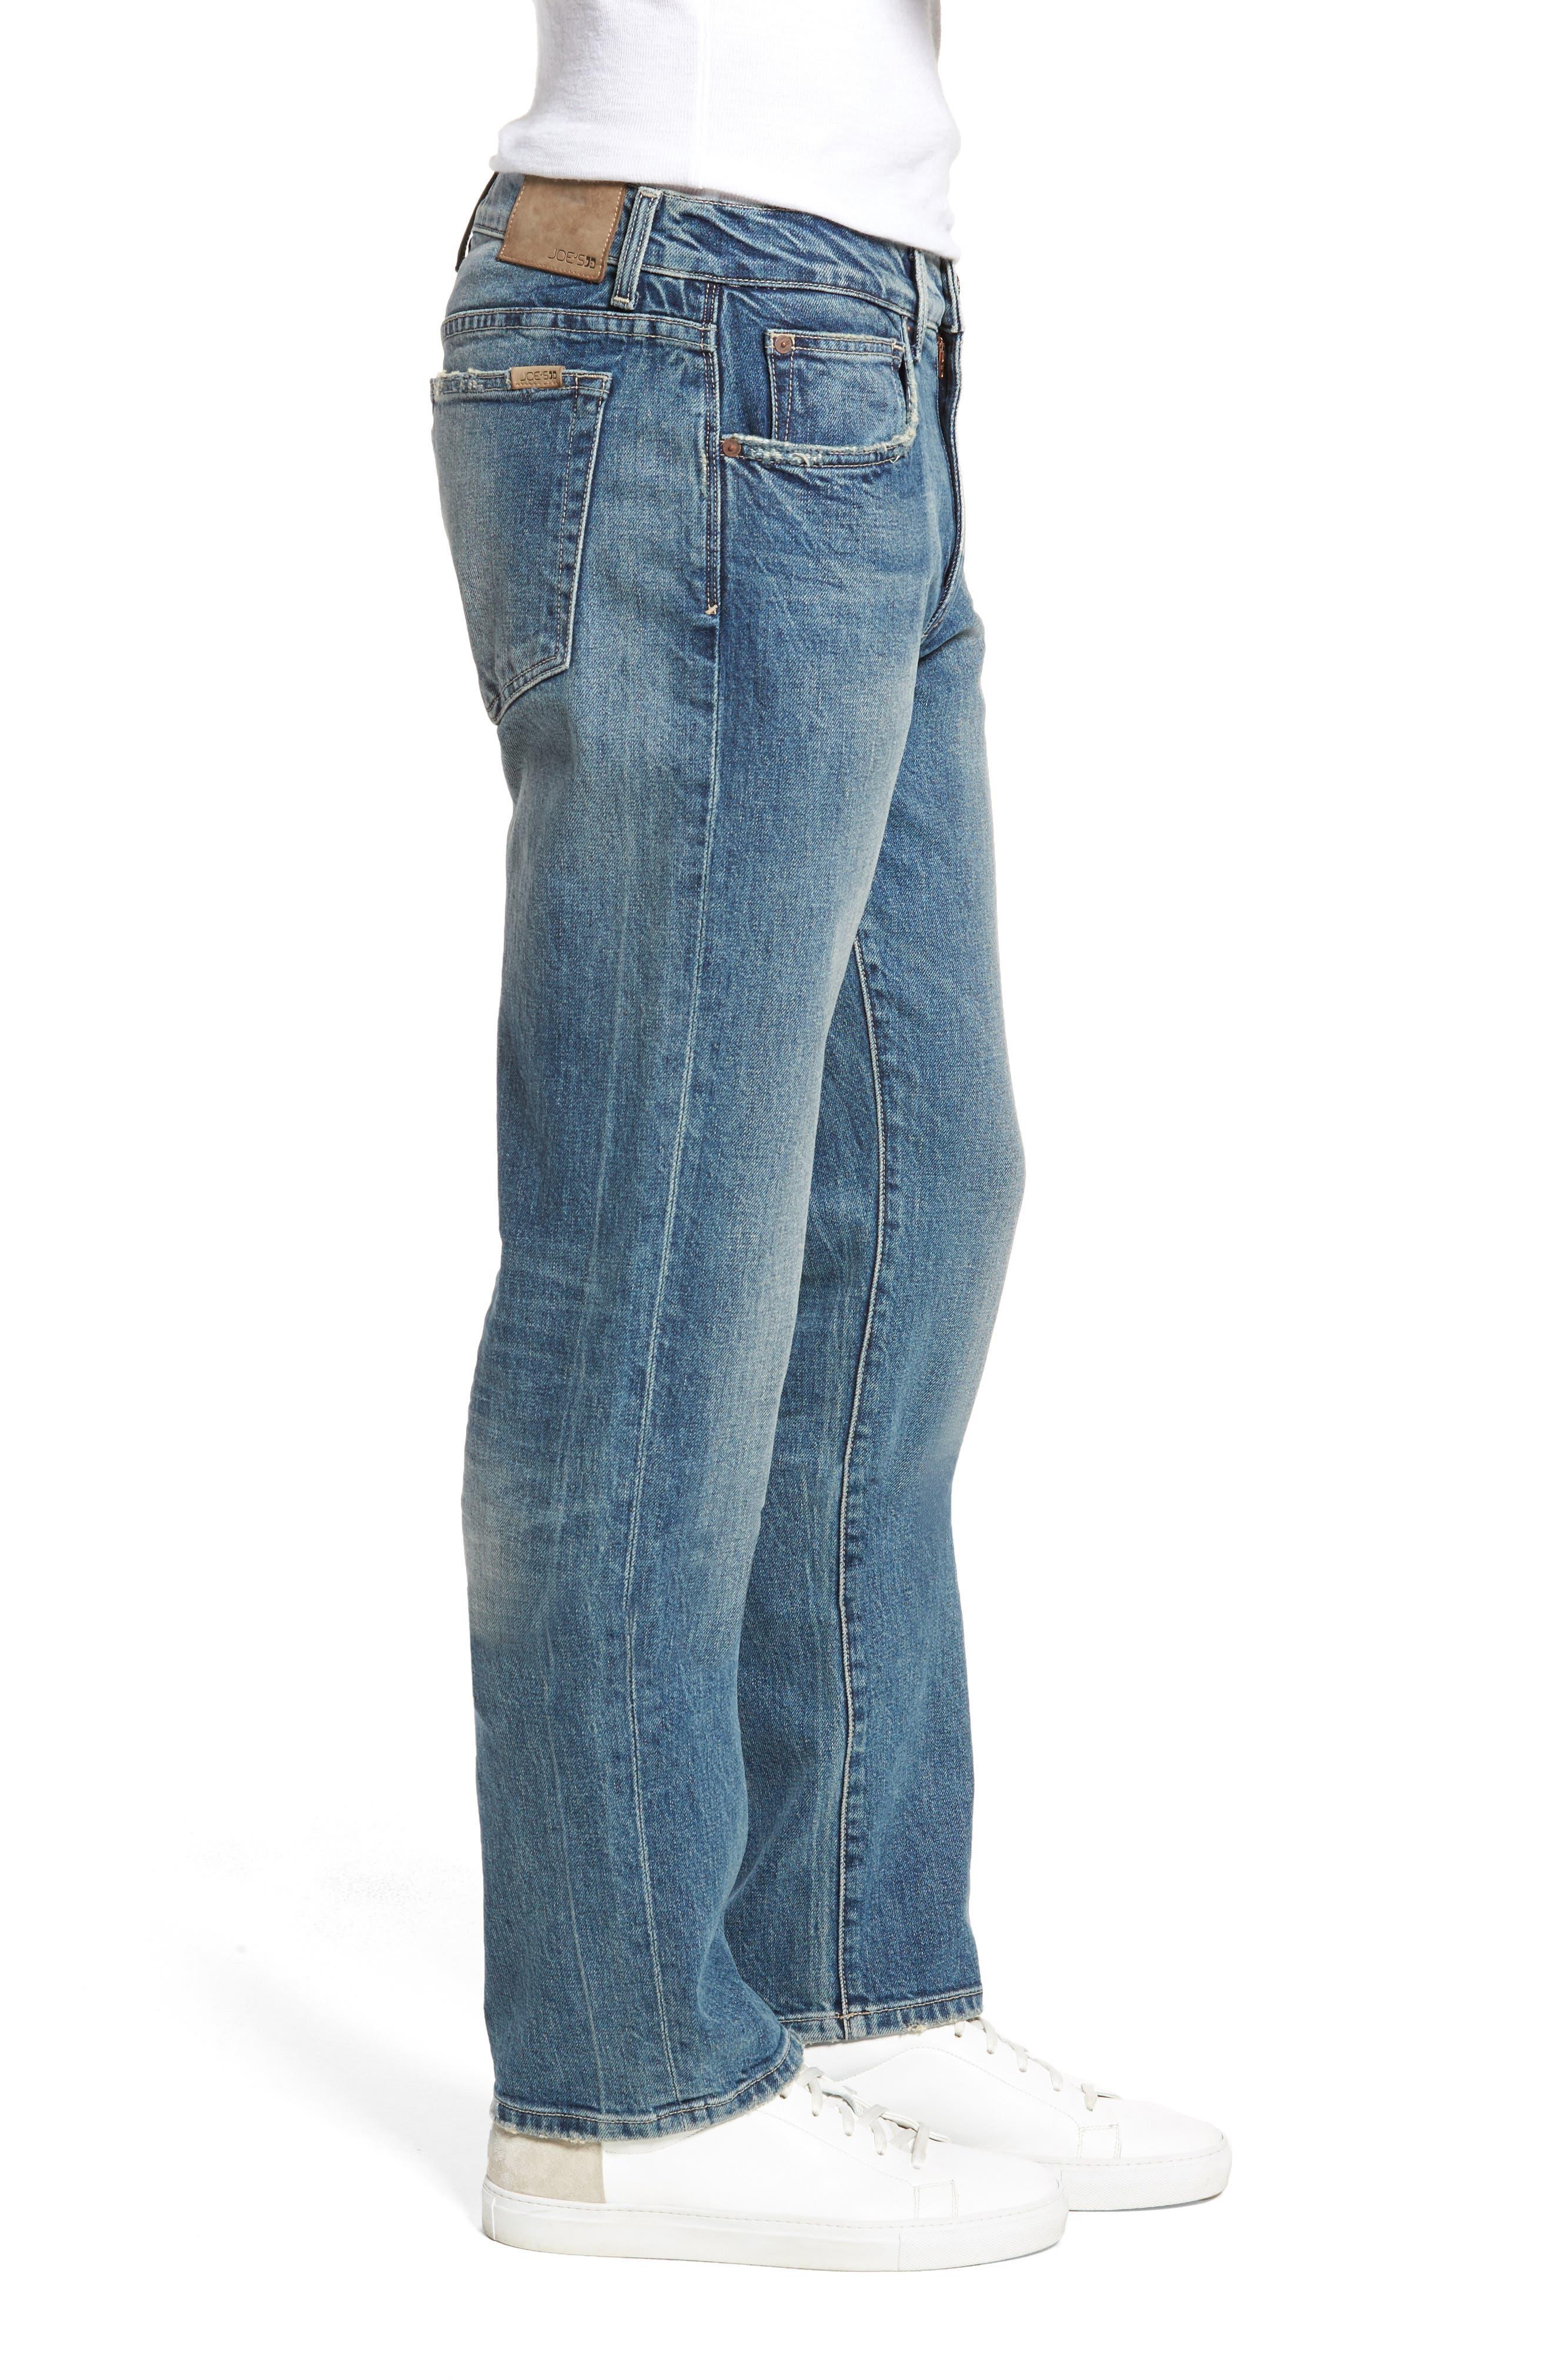 Brixton Slim Straight Fit Jeans,                             Alternate thumbnail 3, color,                             Harken